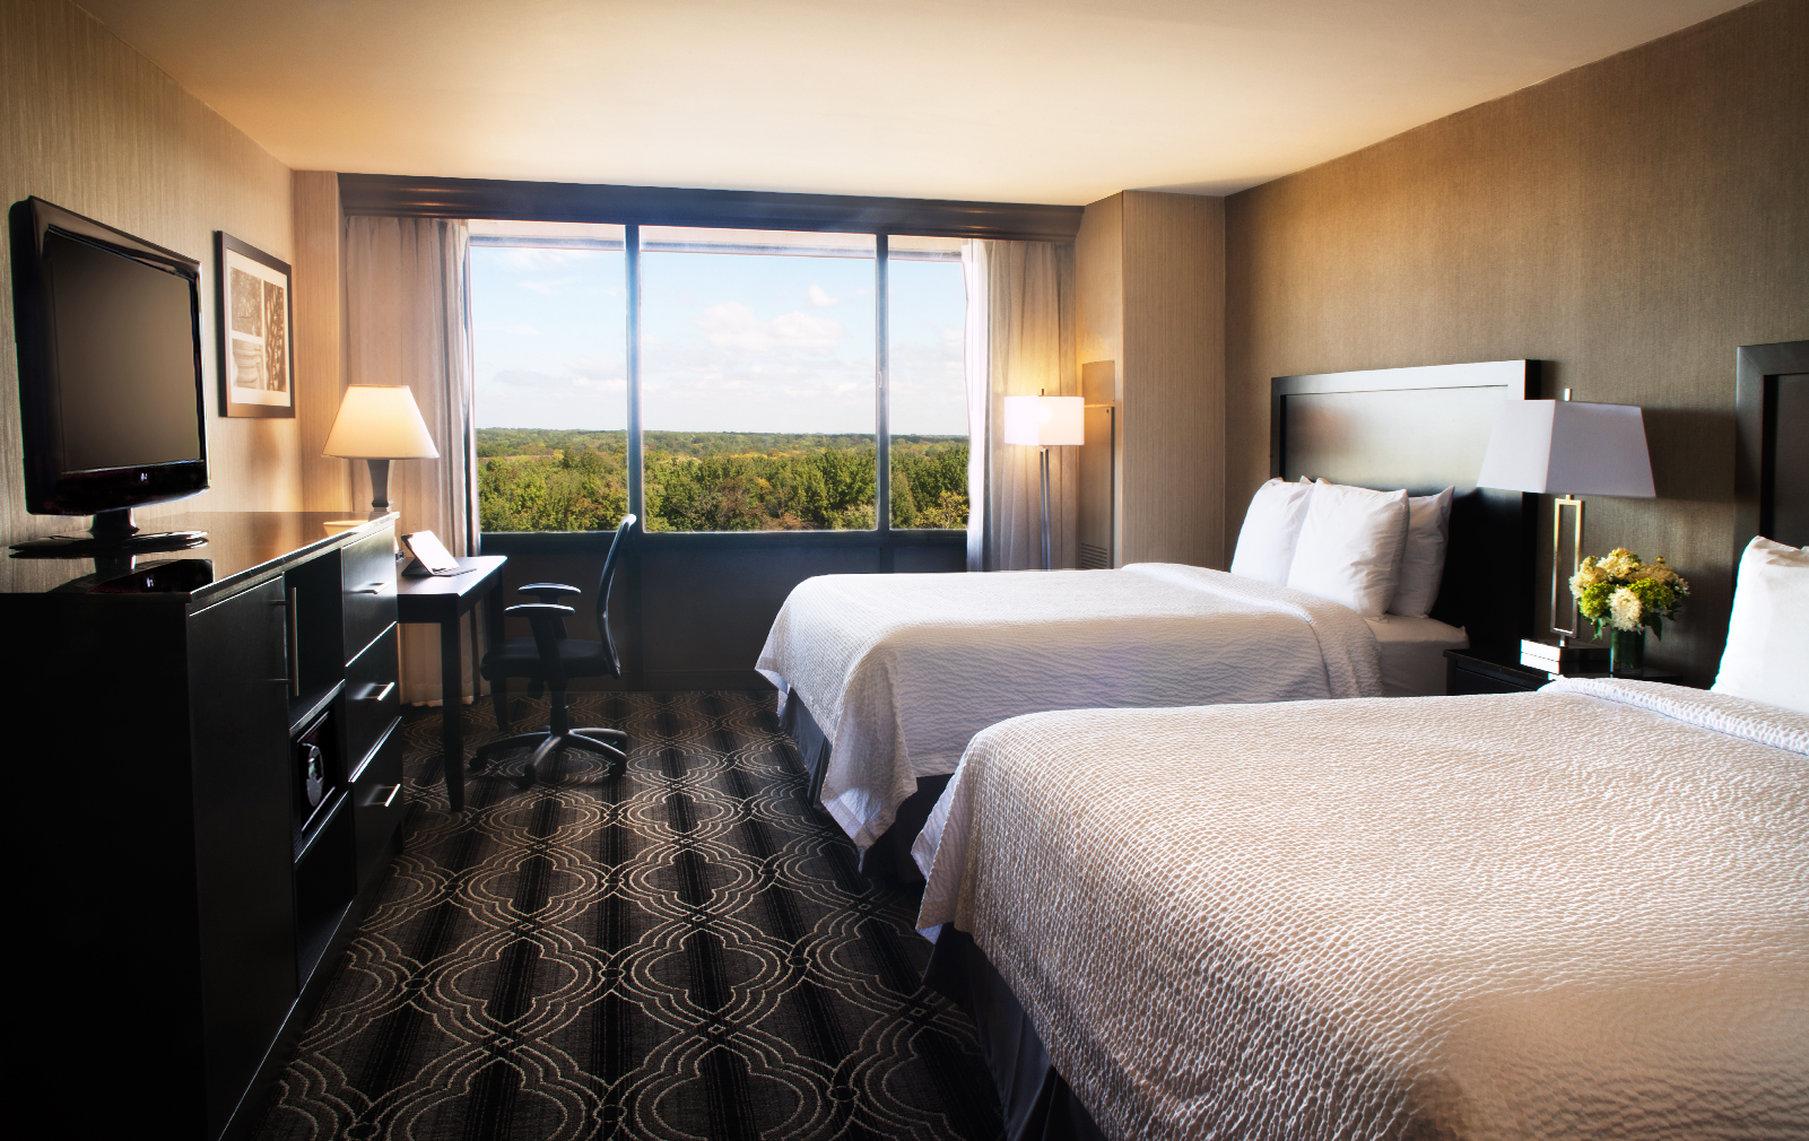 Hotel in Mount Laurel NJ | The Hotel ML